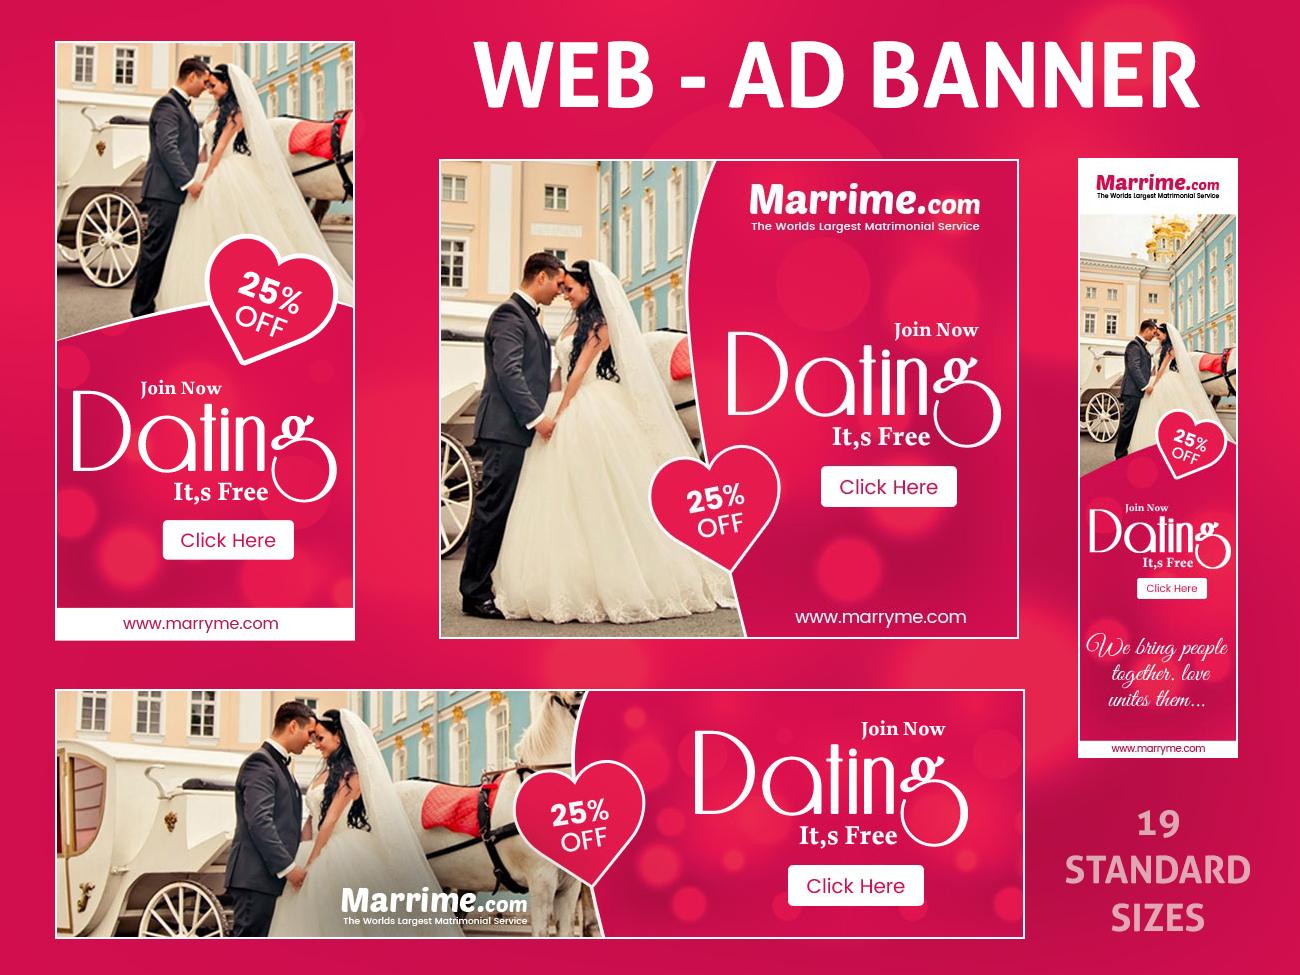 Google Adwords Banner (PPC) google ads google ad banner ppc banner ppc google adwords banner